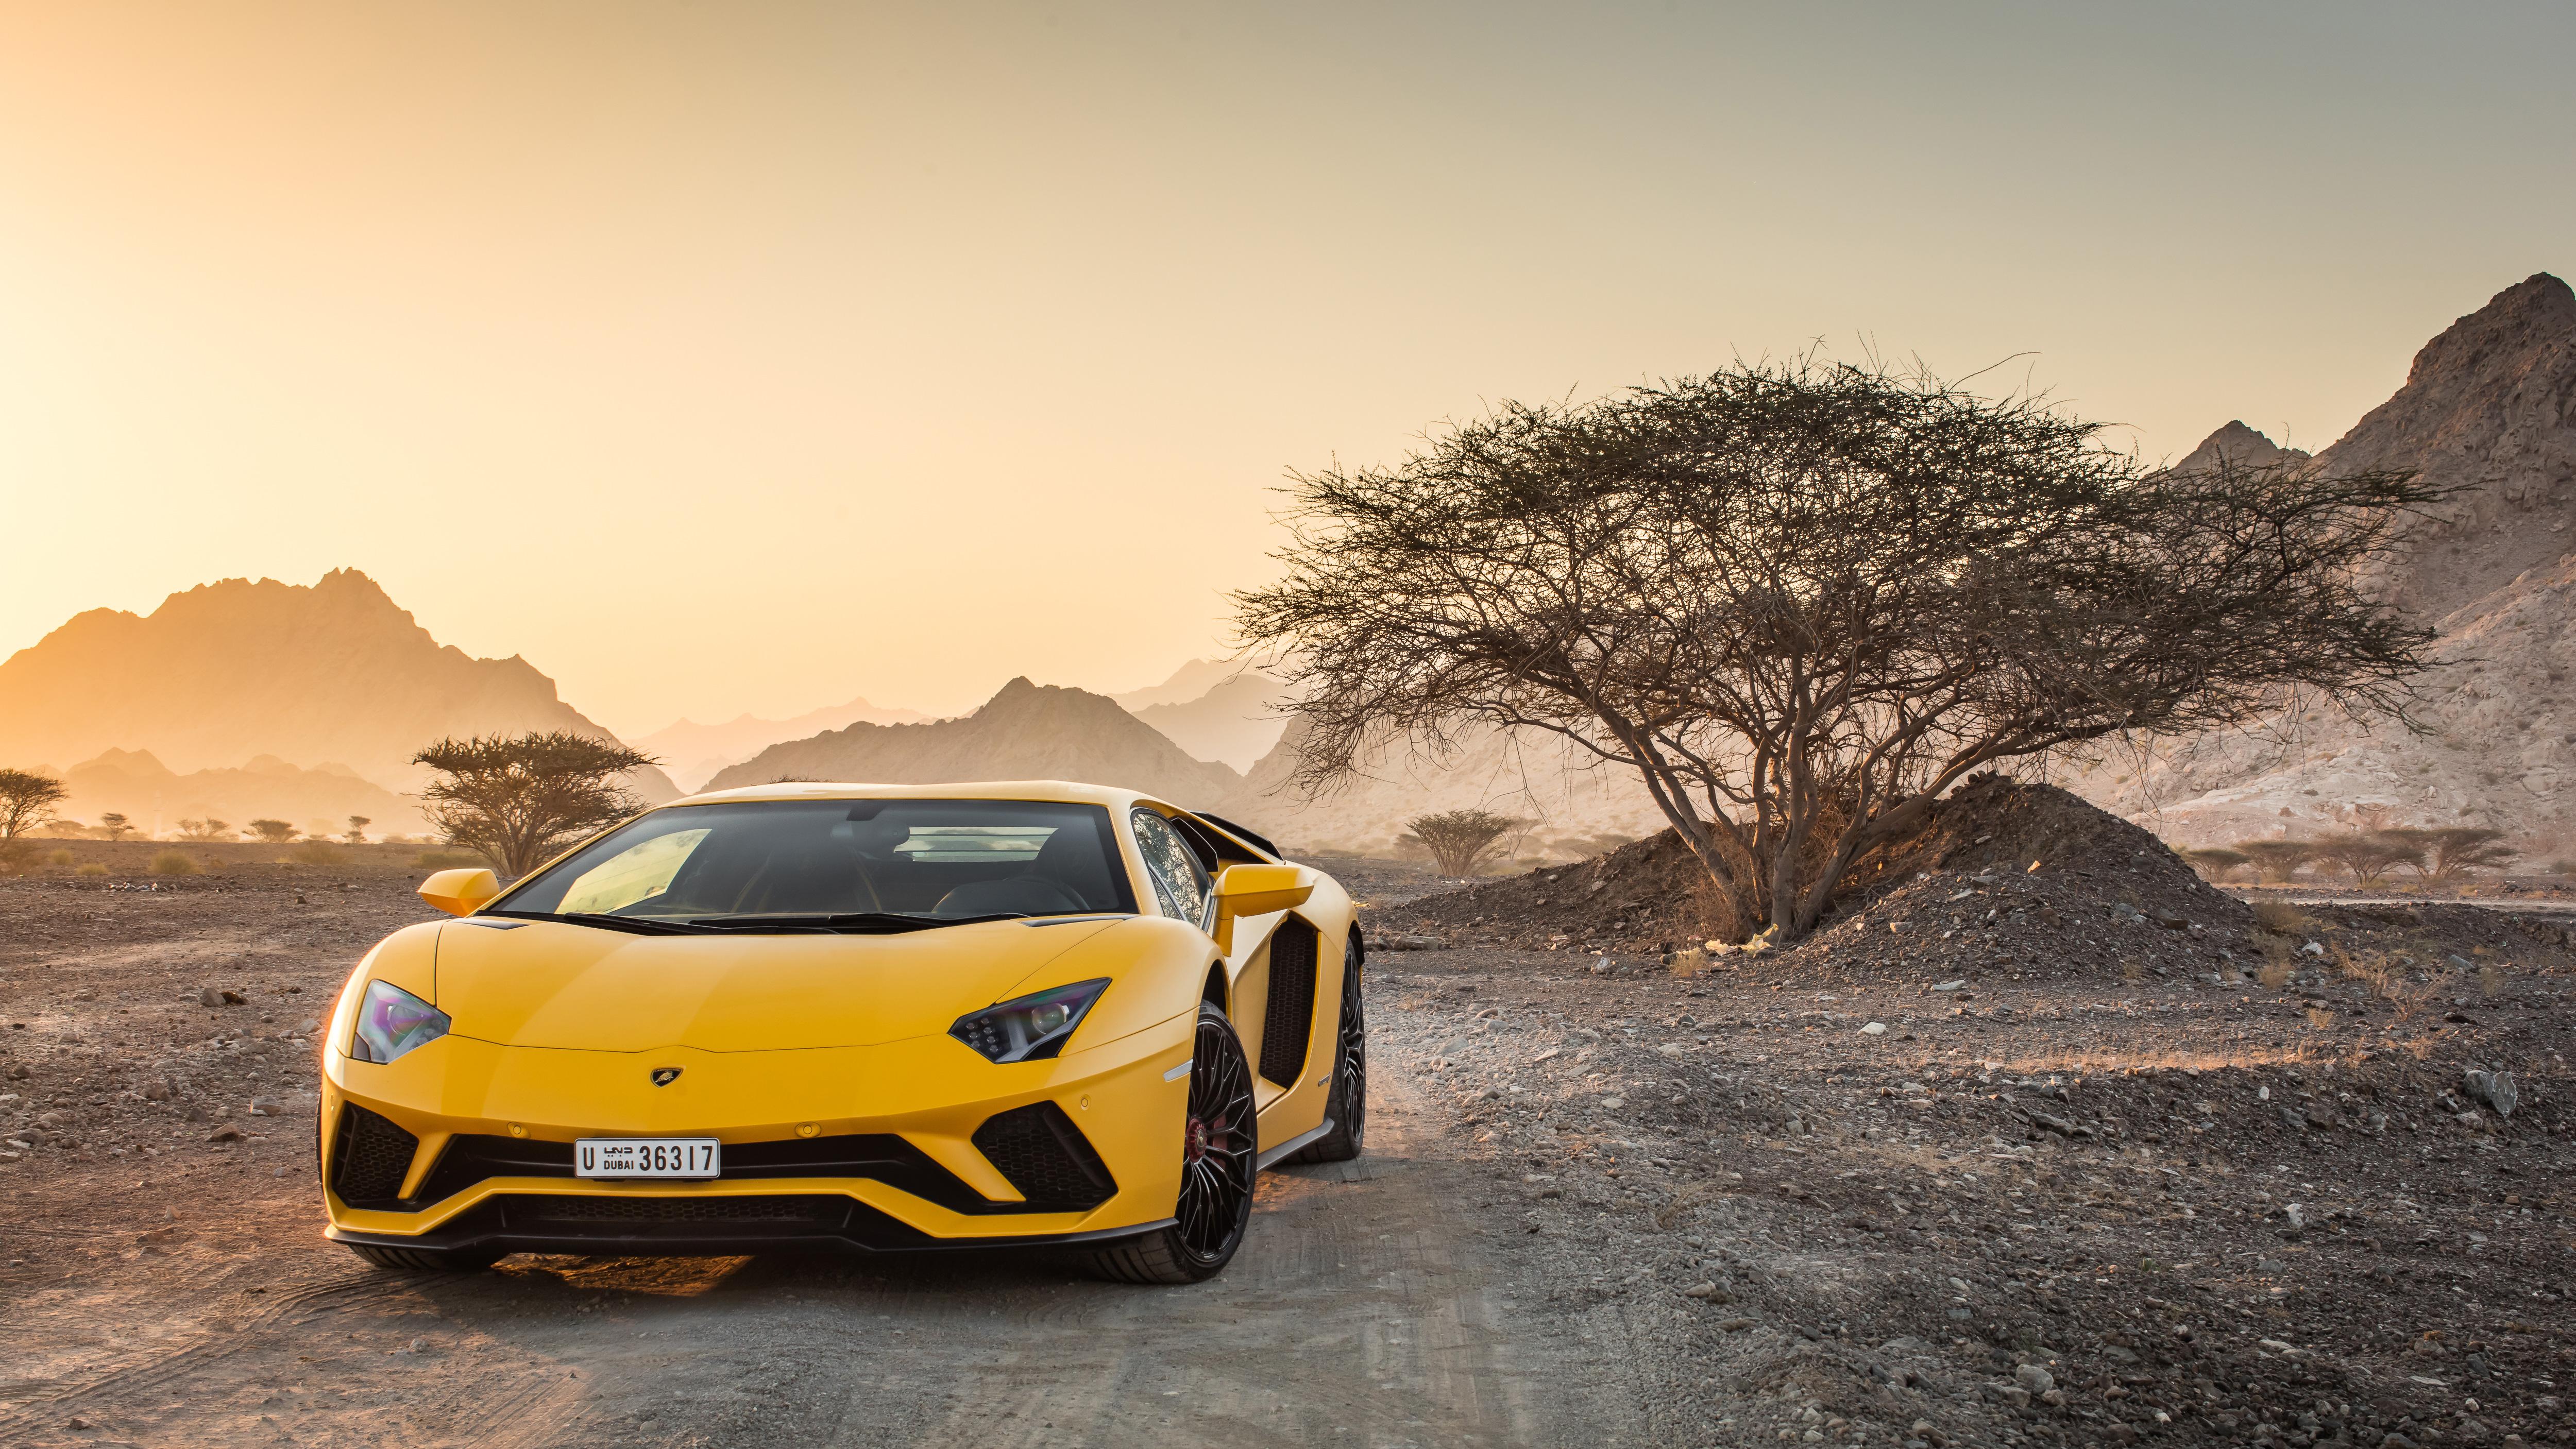 Lamborghini Aventador Car 4k Hd Desktop Wallpaper For 4k: Yellow Lamborghini Aventador 5k, HD Cars, 4k Wallpapers